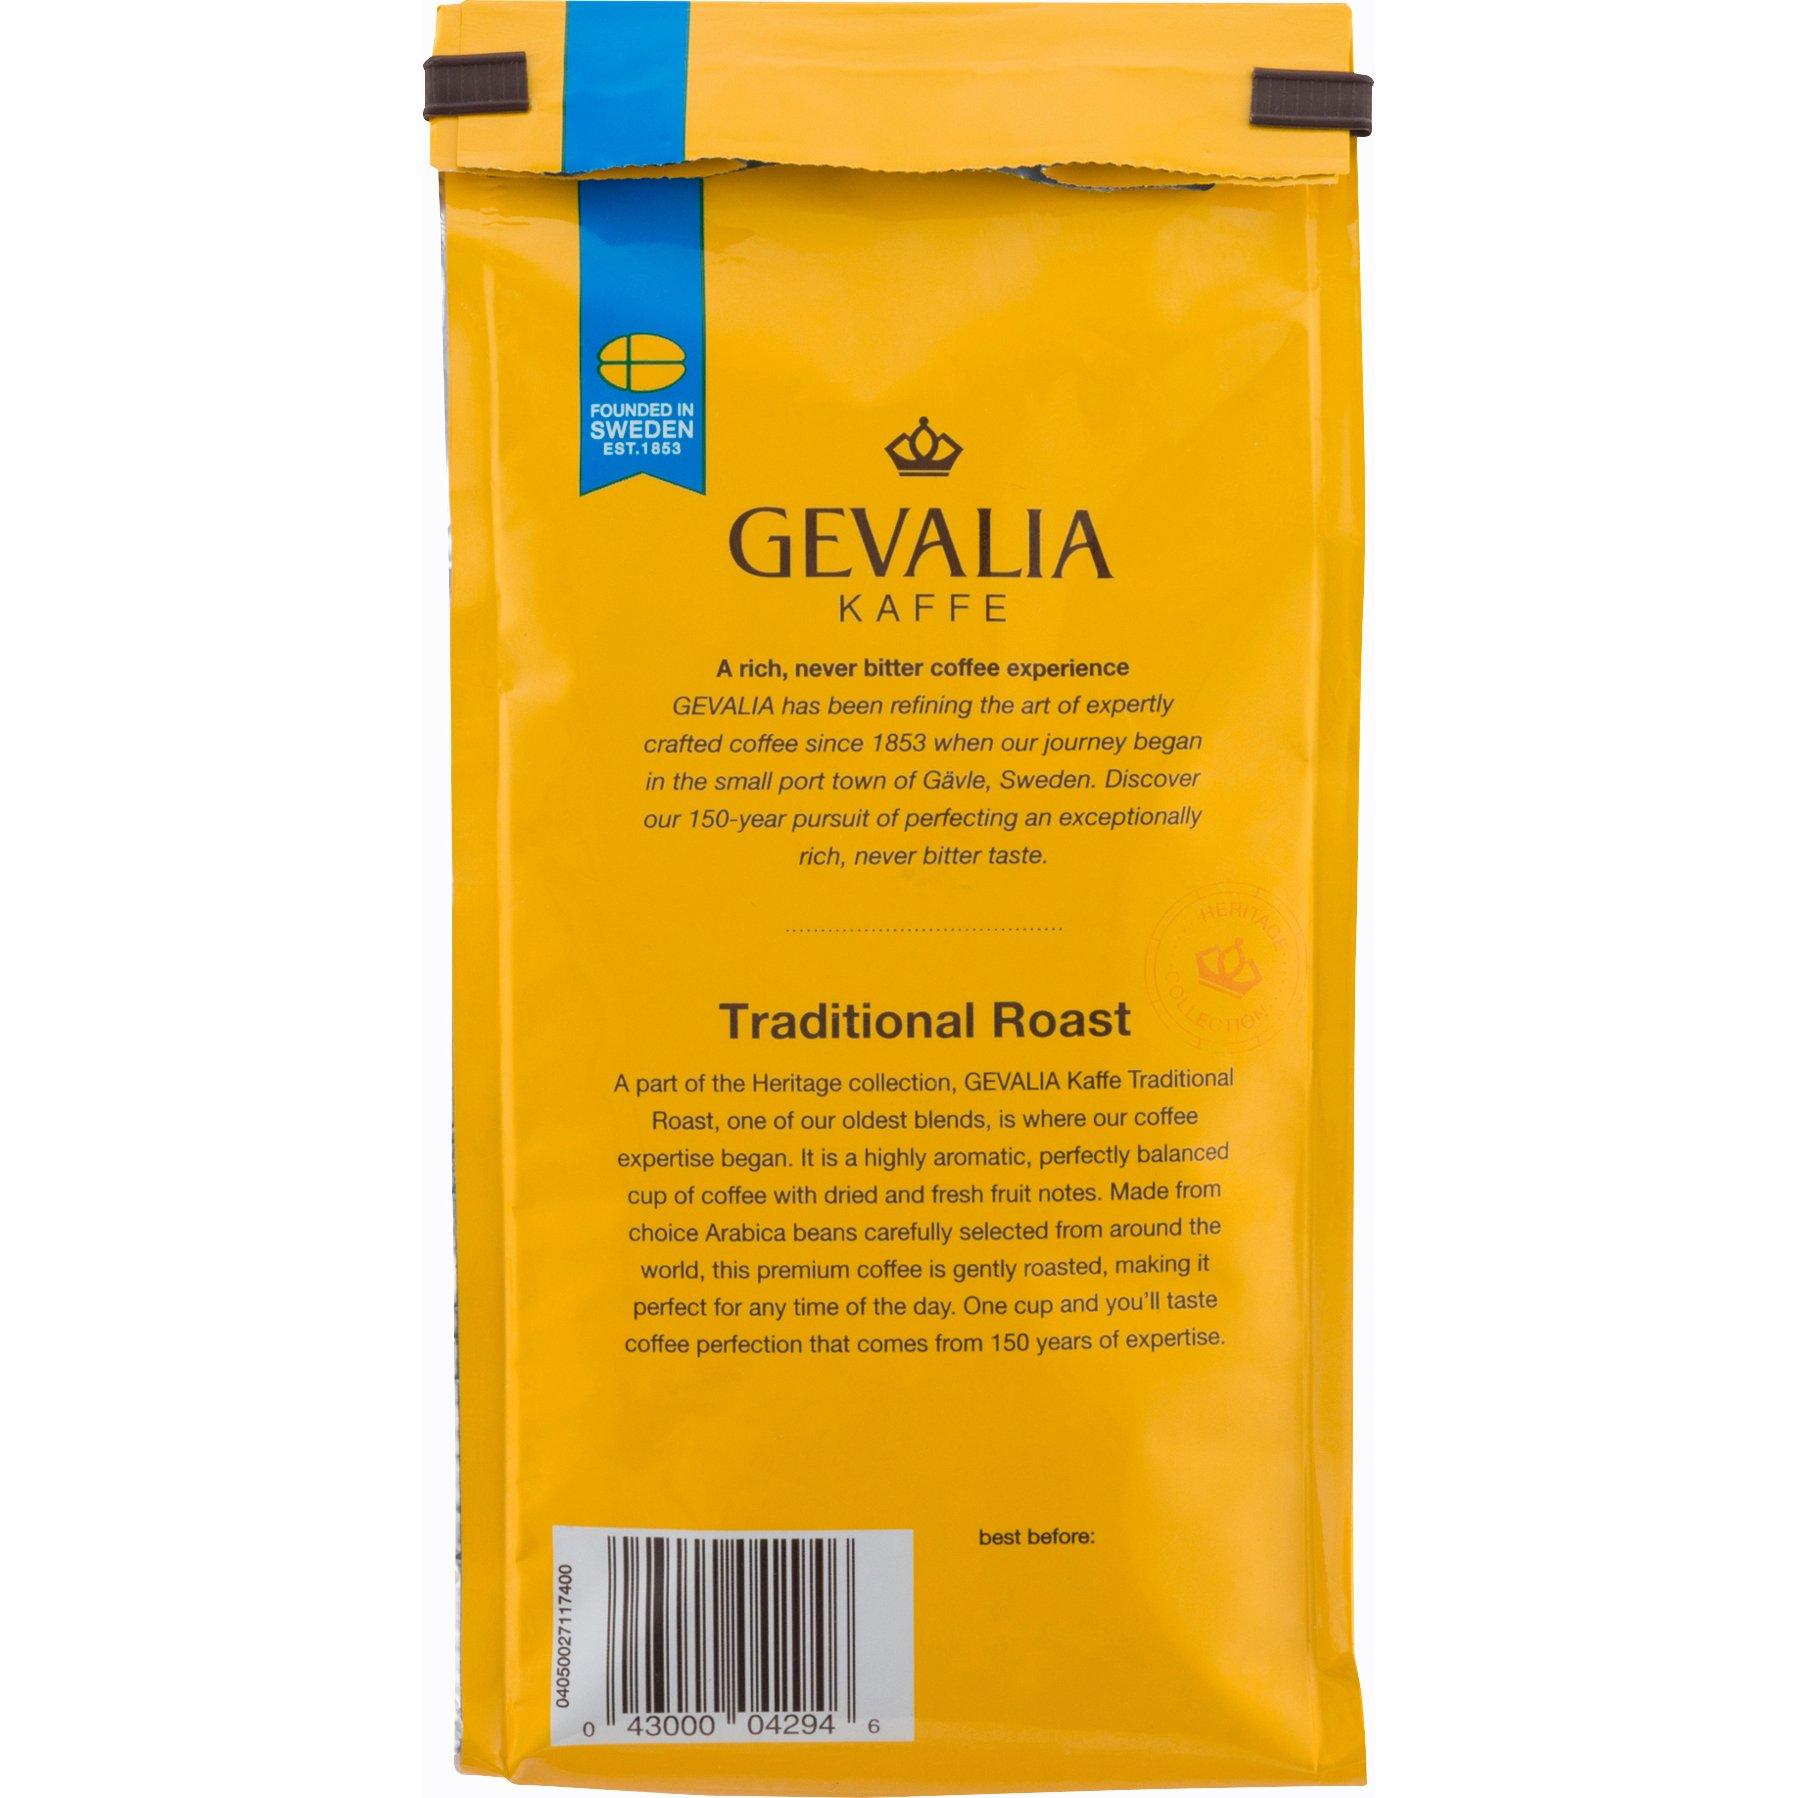 GEVALIA Traditional Roast Coffee, Mild, Whole Bean, 12 Ounce, 6 Pack by Gevalia (Image #3)